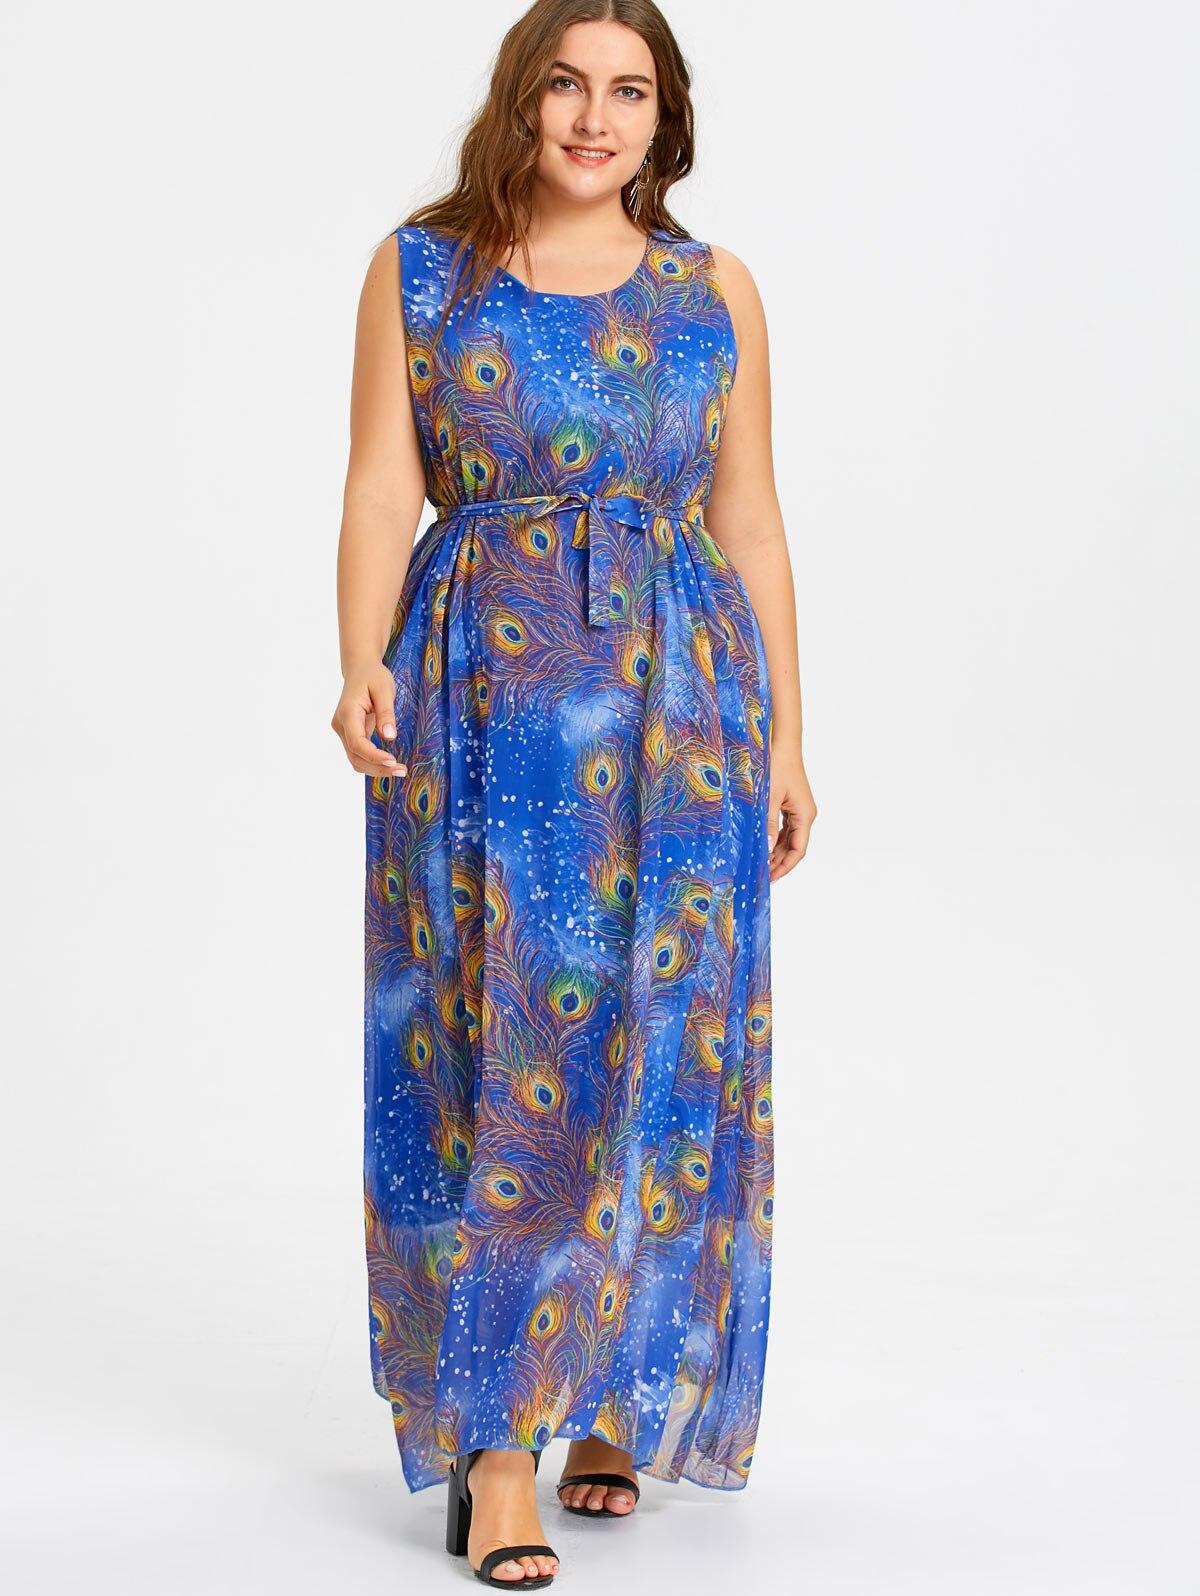 1504ffd027 top 10 largest bohemian peacock printed sleeveless chiffon women ...